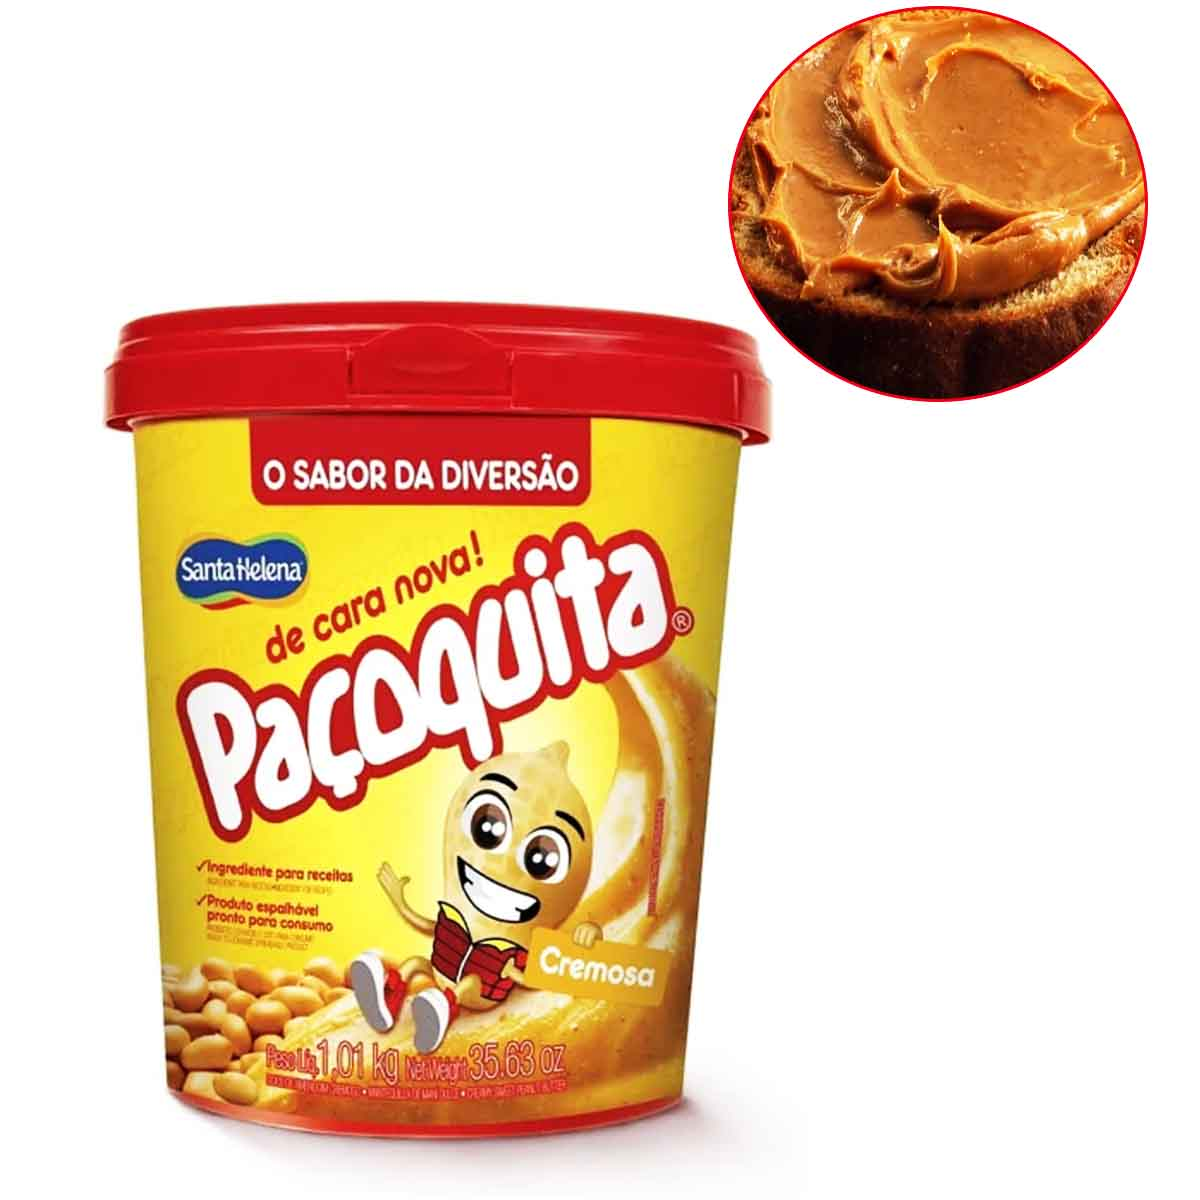 Paçoquita Cremosa Pote 1kg Santa Helena